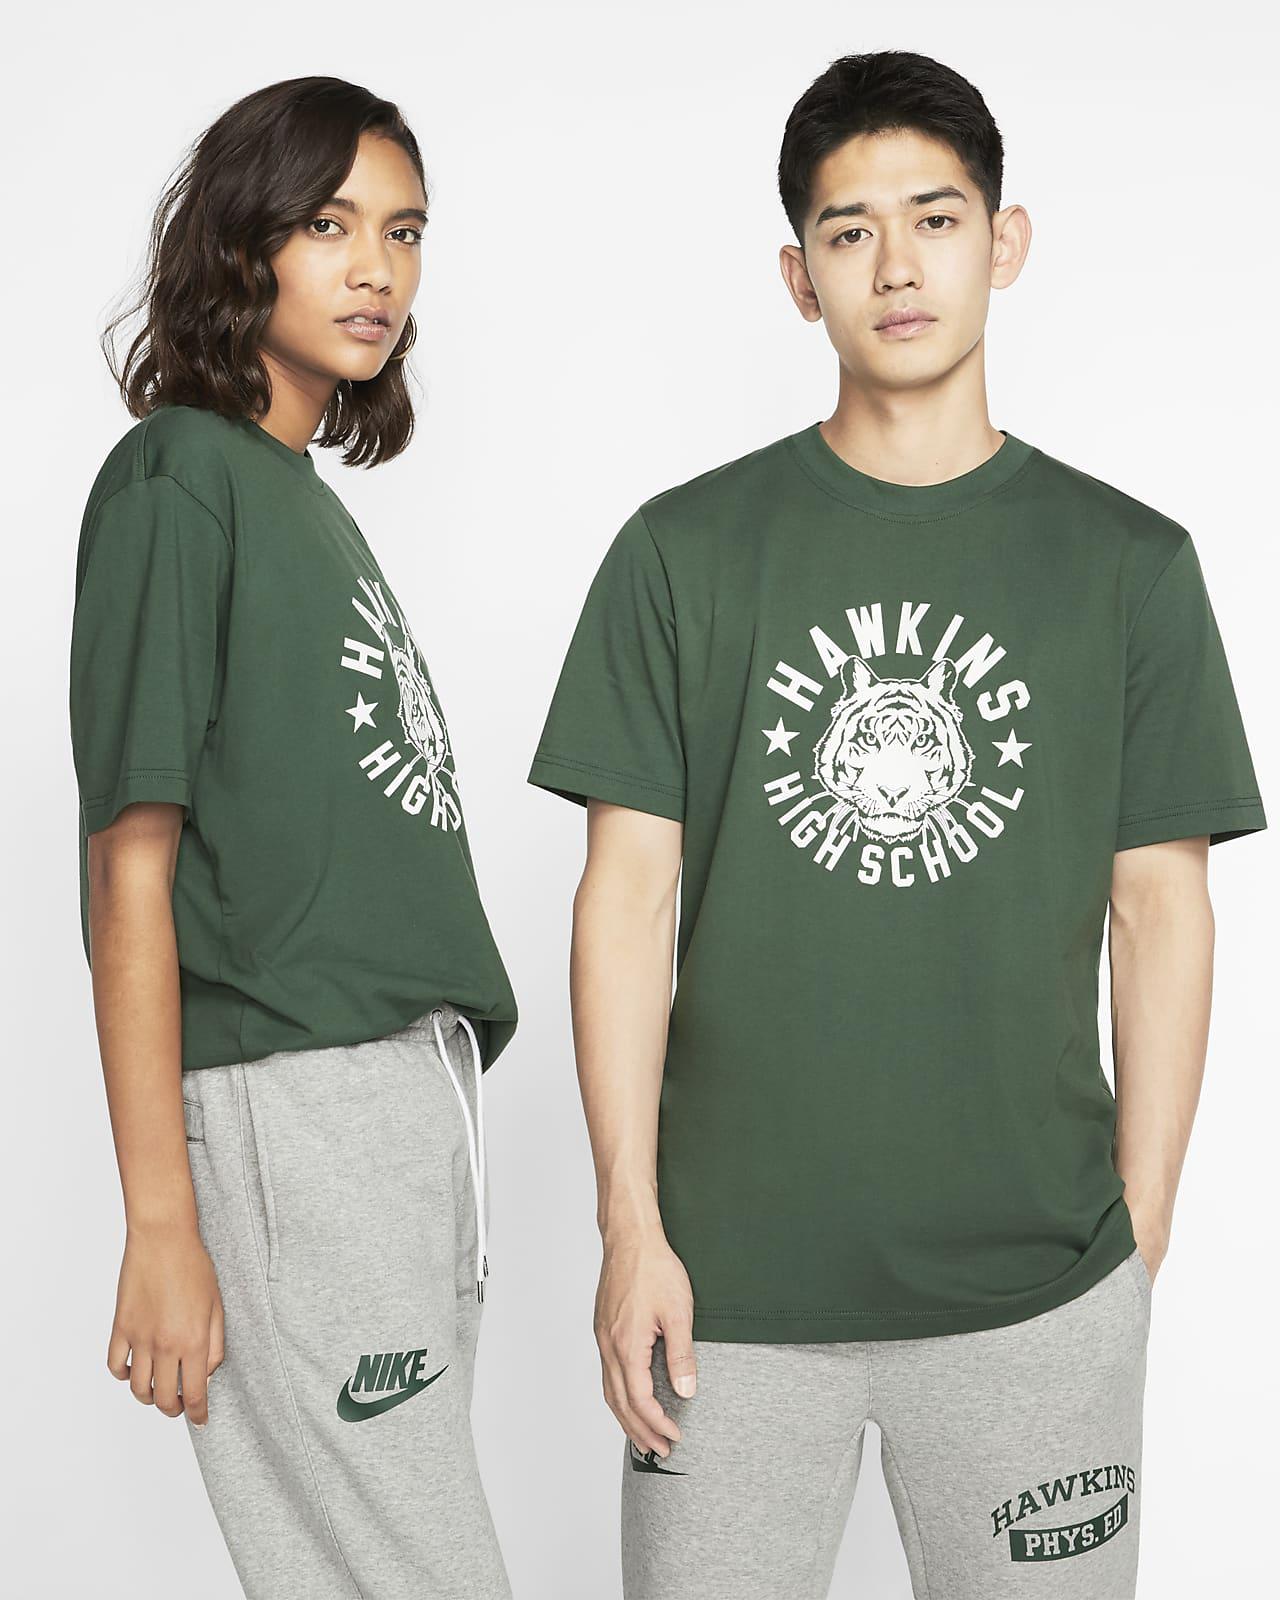 Nike x Stranger Things Men's T-Shirt